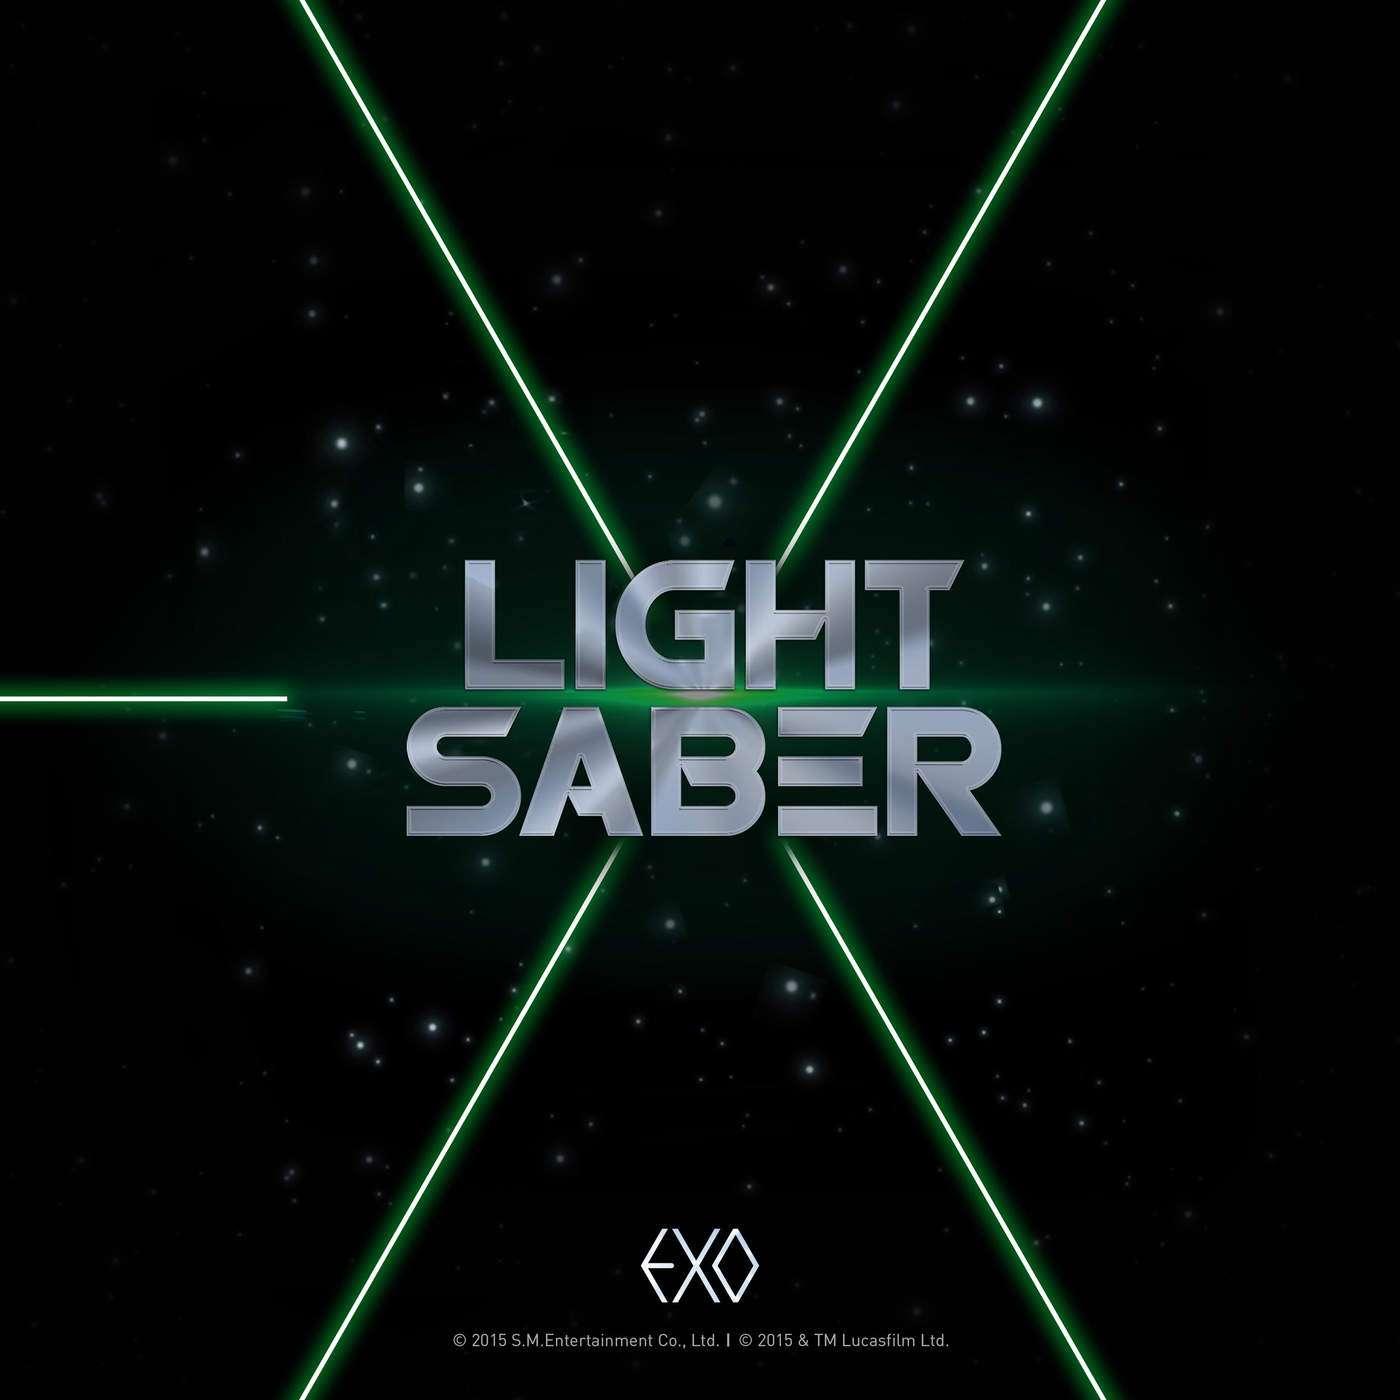 EXO – Lightsaber (Japanese Version) K2Ost free mp3 download korean song kpop kdrama ost lyric 320 kbps